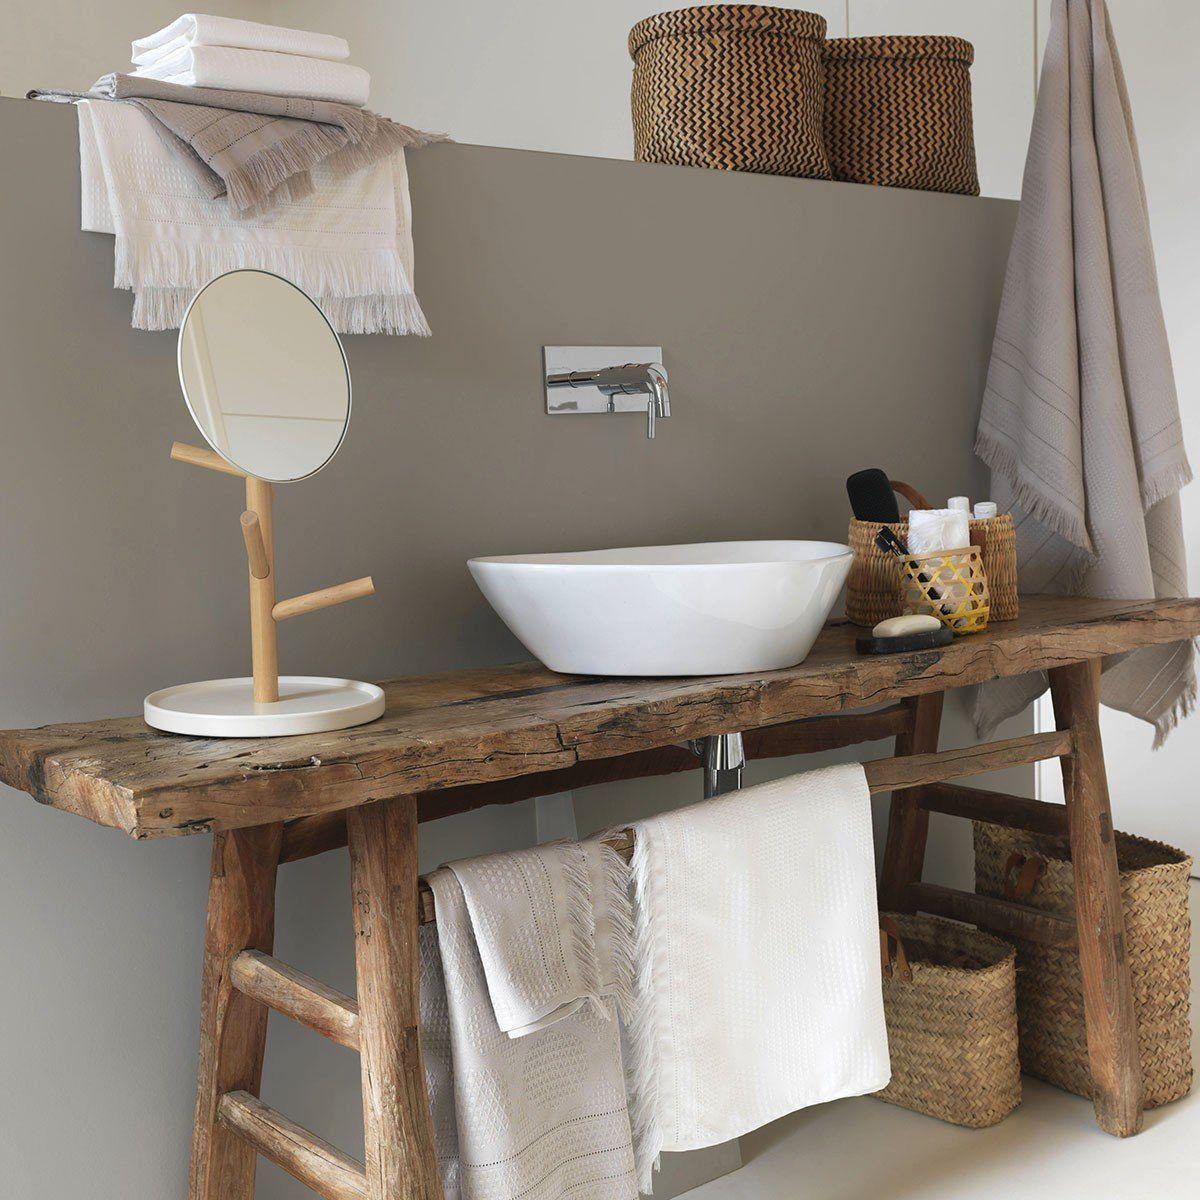 Hera White Bath Collection - Bath Sheet 35\ x 59\